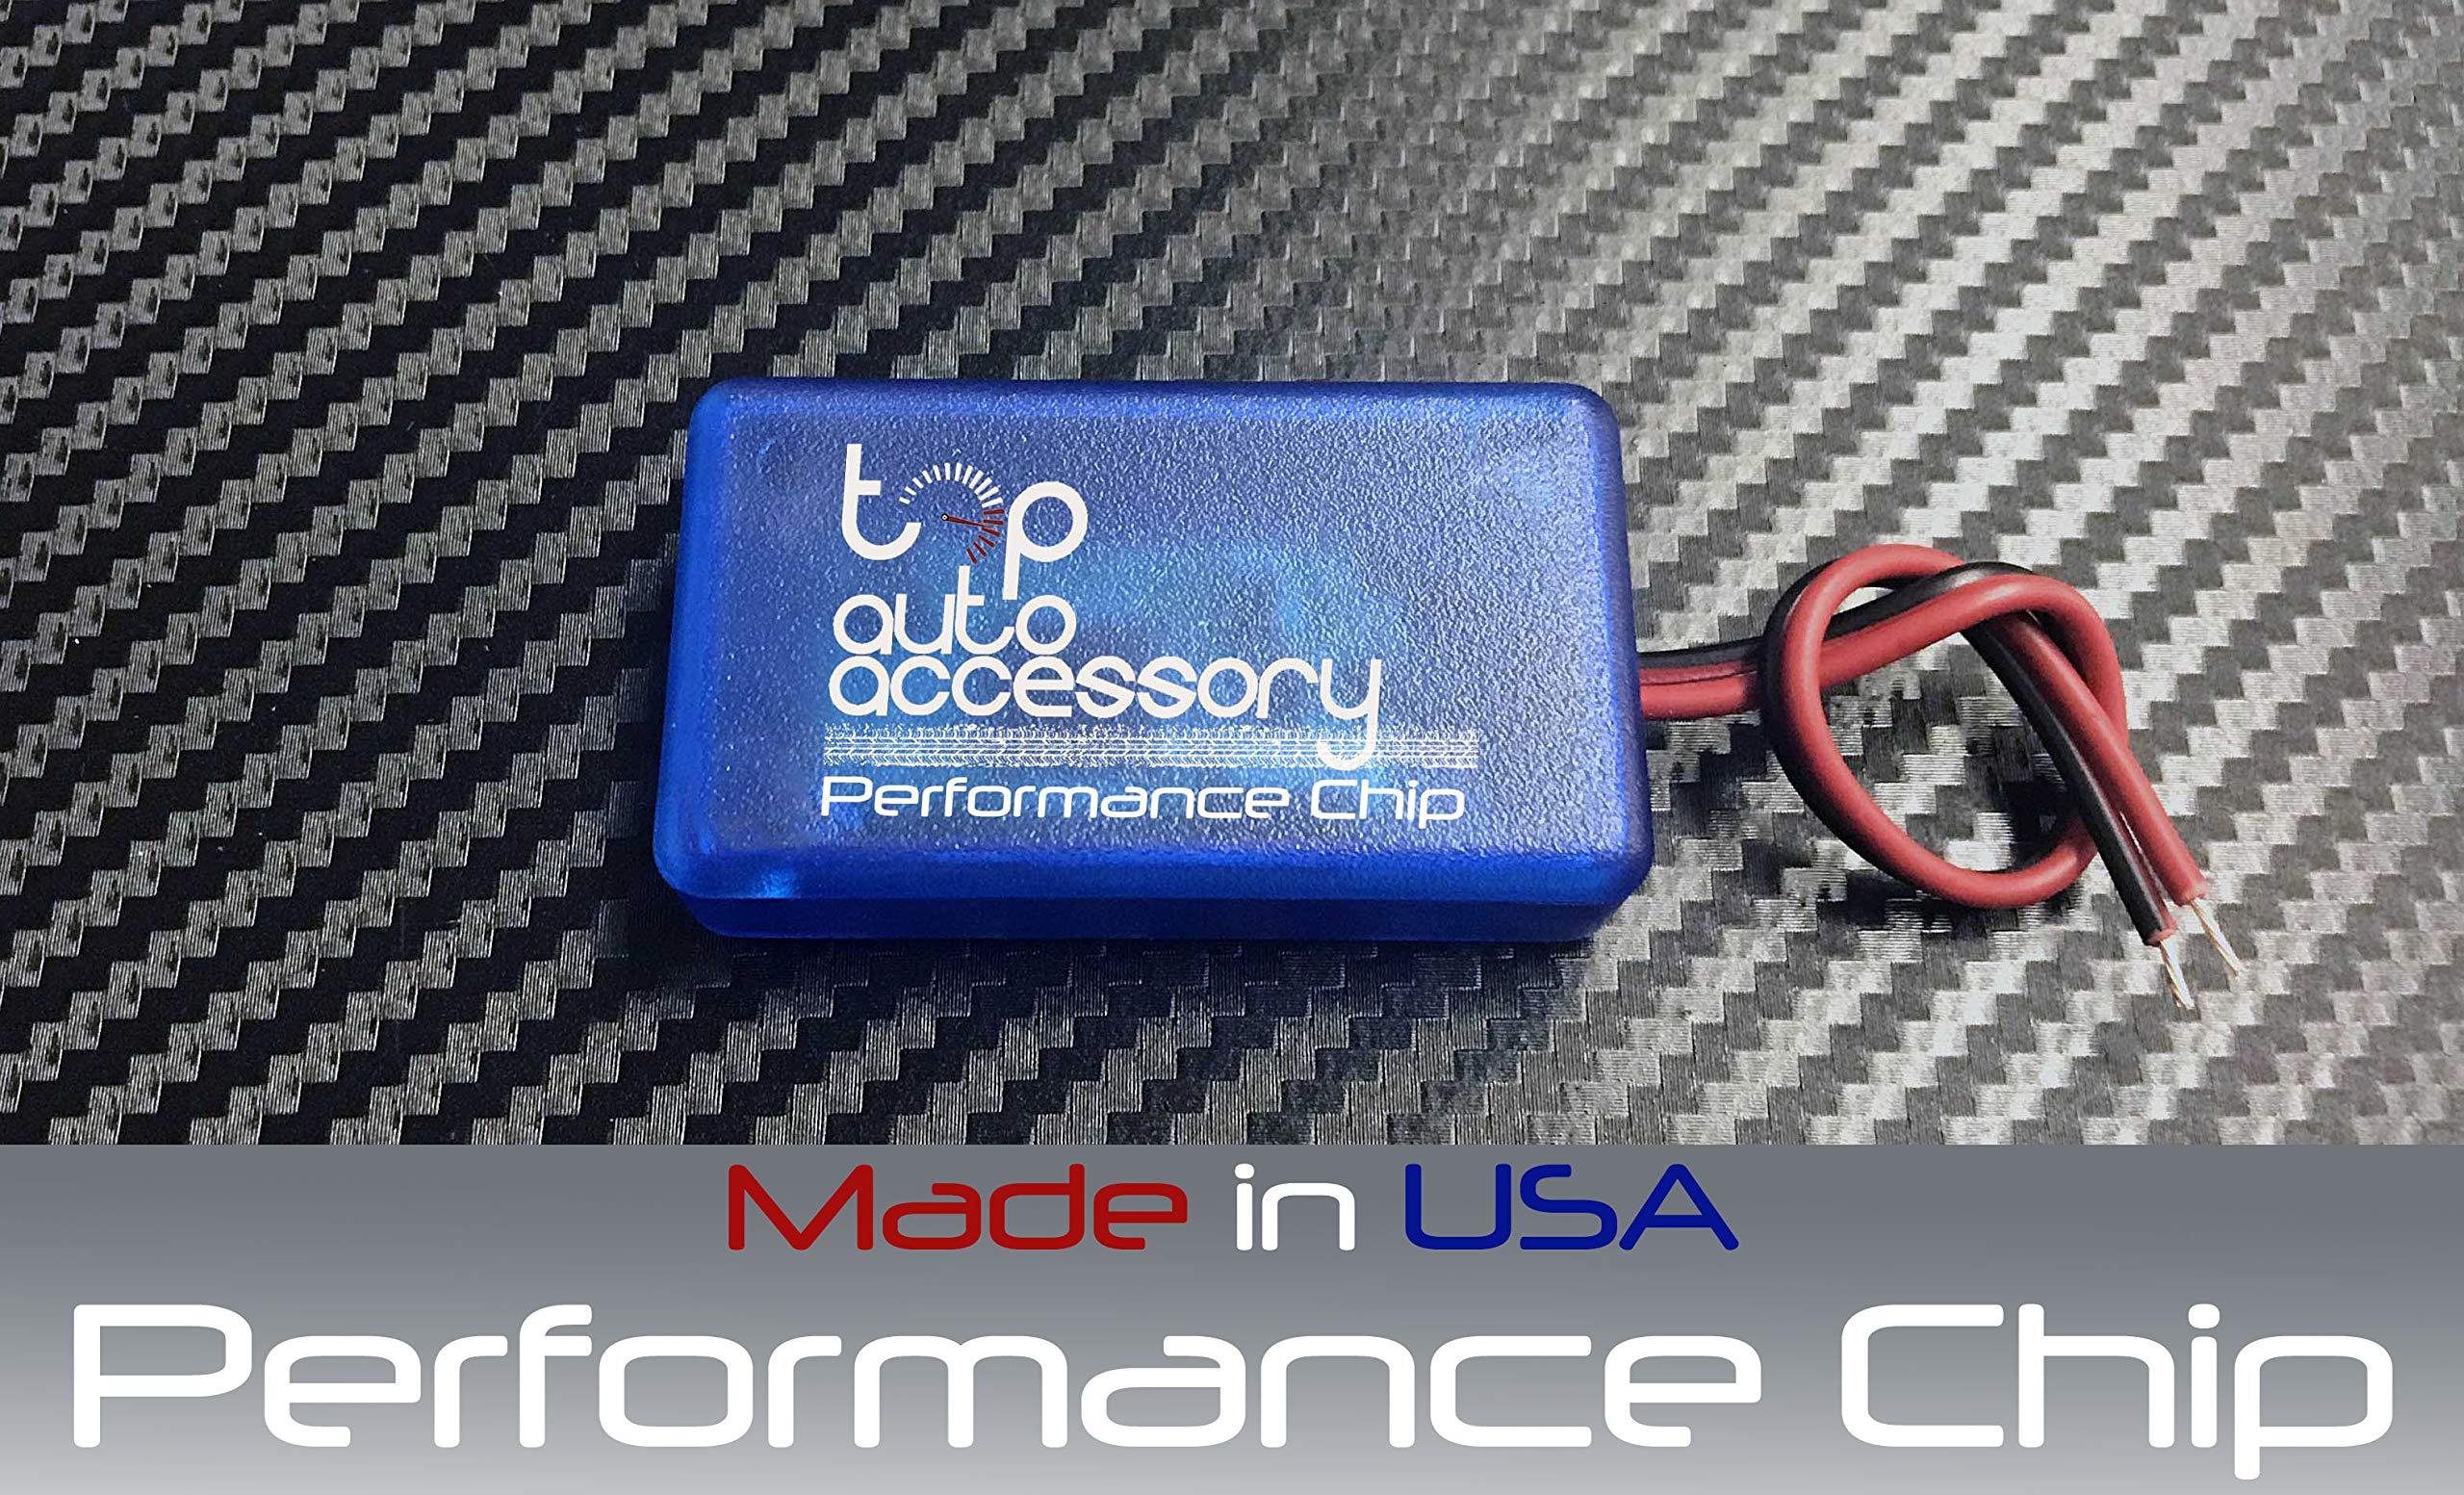 Performance Speed Chip Racing Torque Horsepower Power ECU Module for CF-Moto CFORCE 400 CFORCE 500 600 800 Jetmax